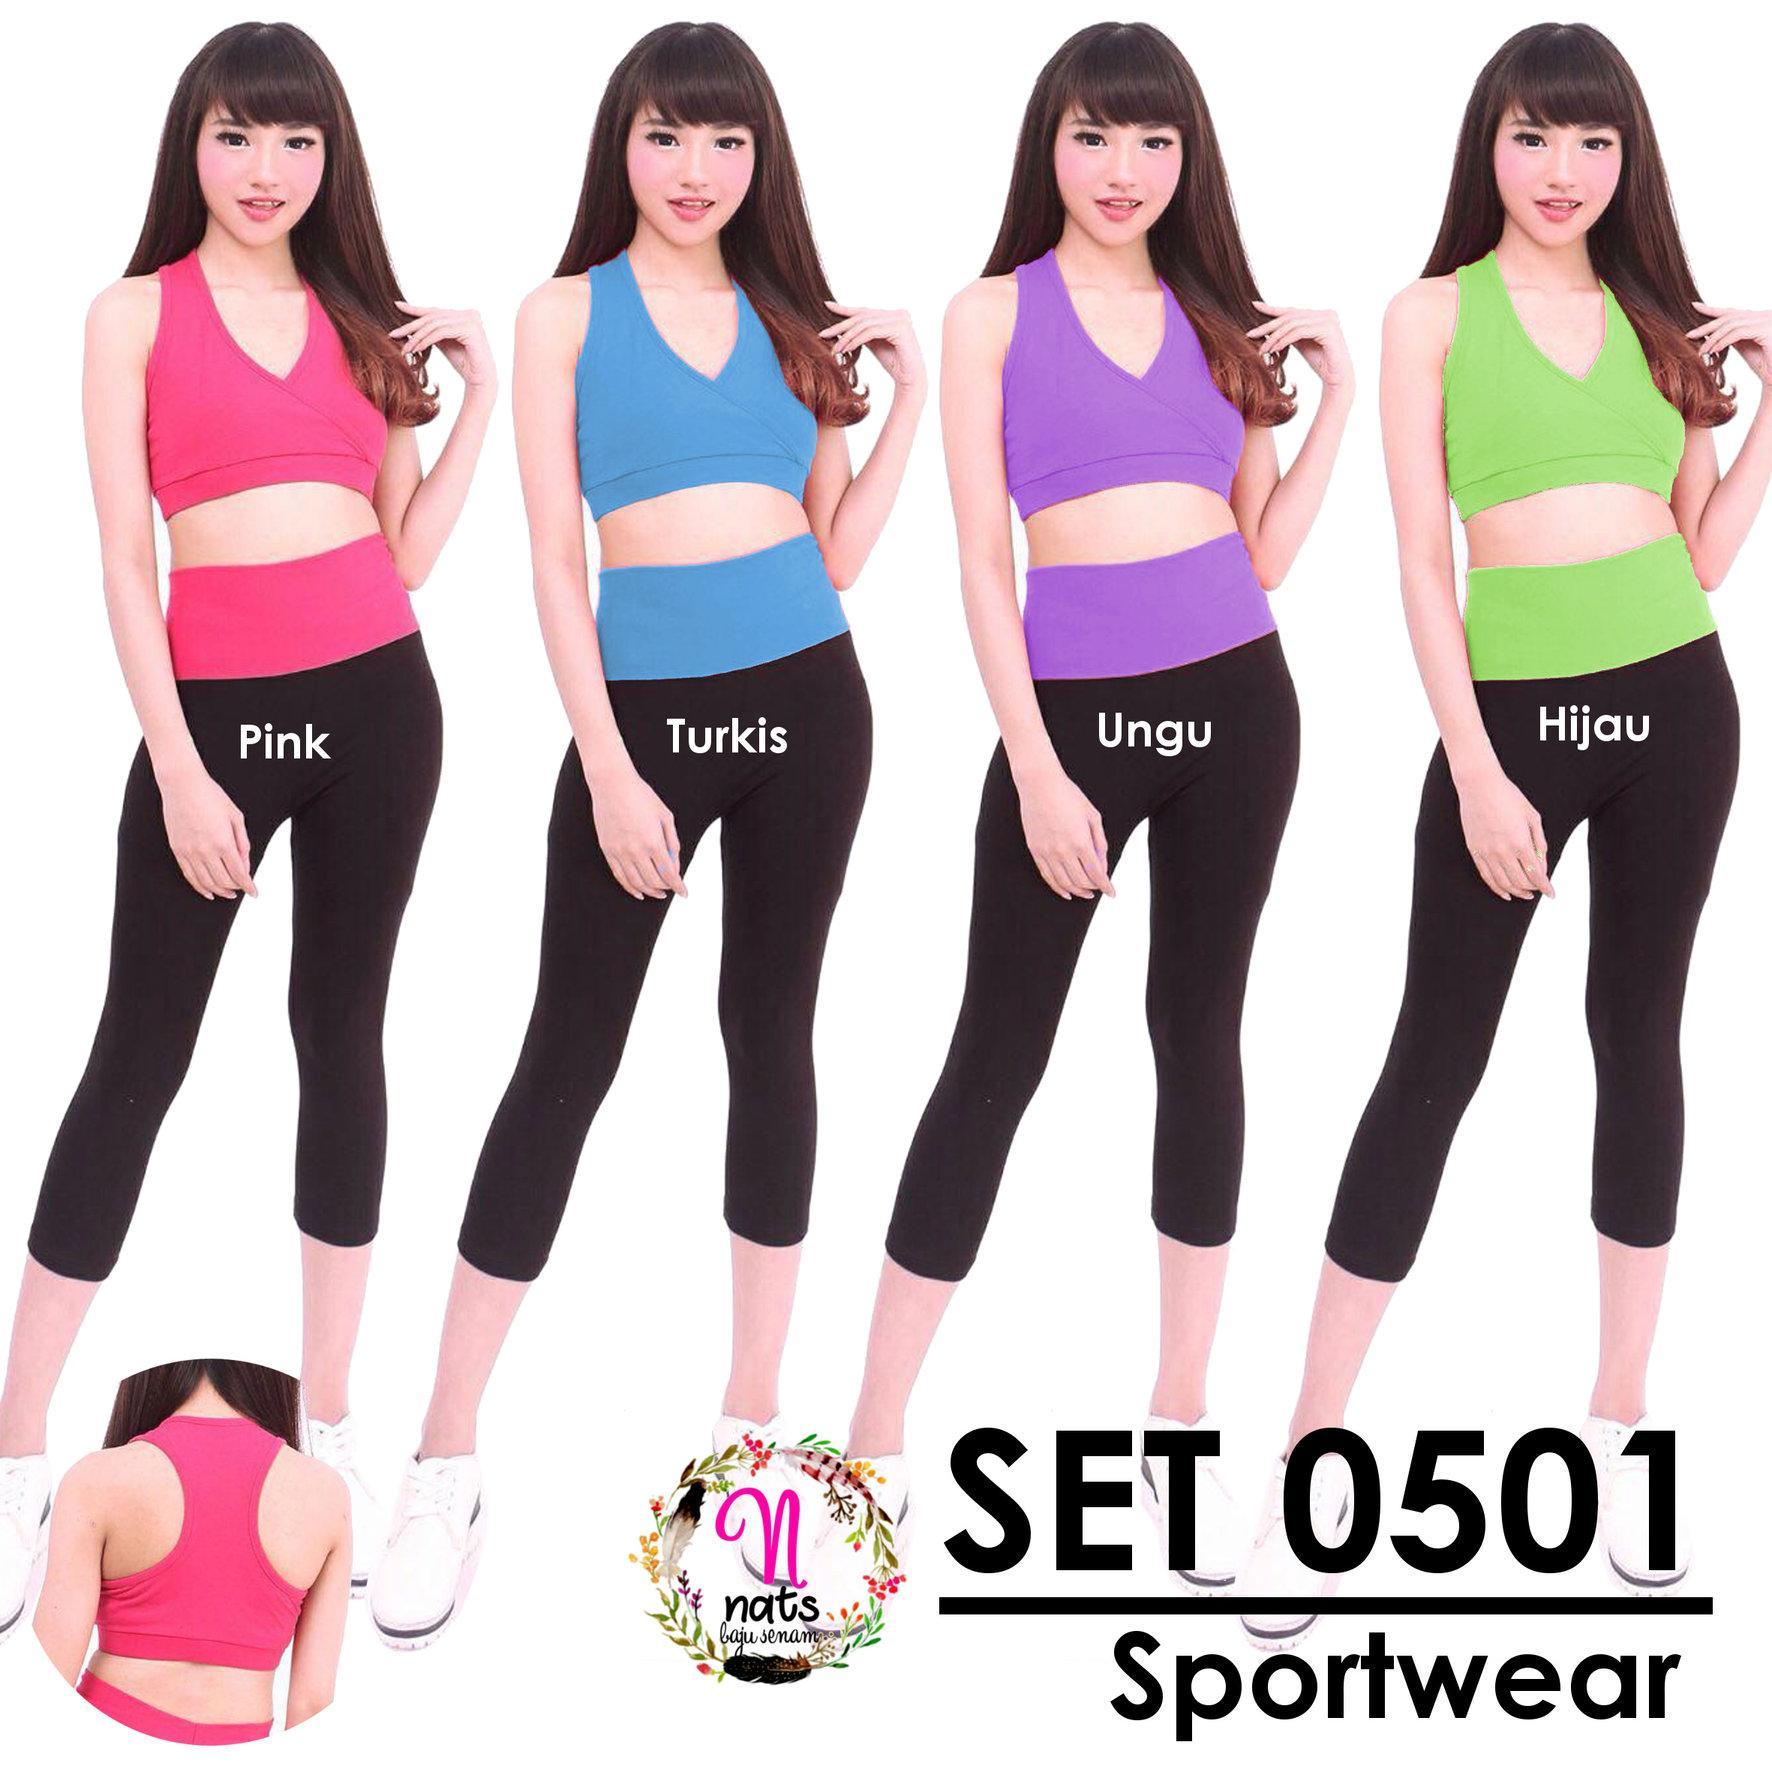 Setelan Senam 0501 COLOR / Baju Senam Bra senam Celana senam Legging senam zumba yoga aerobic gym fitness